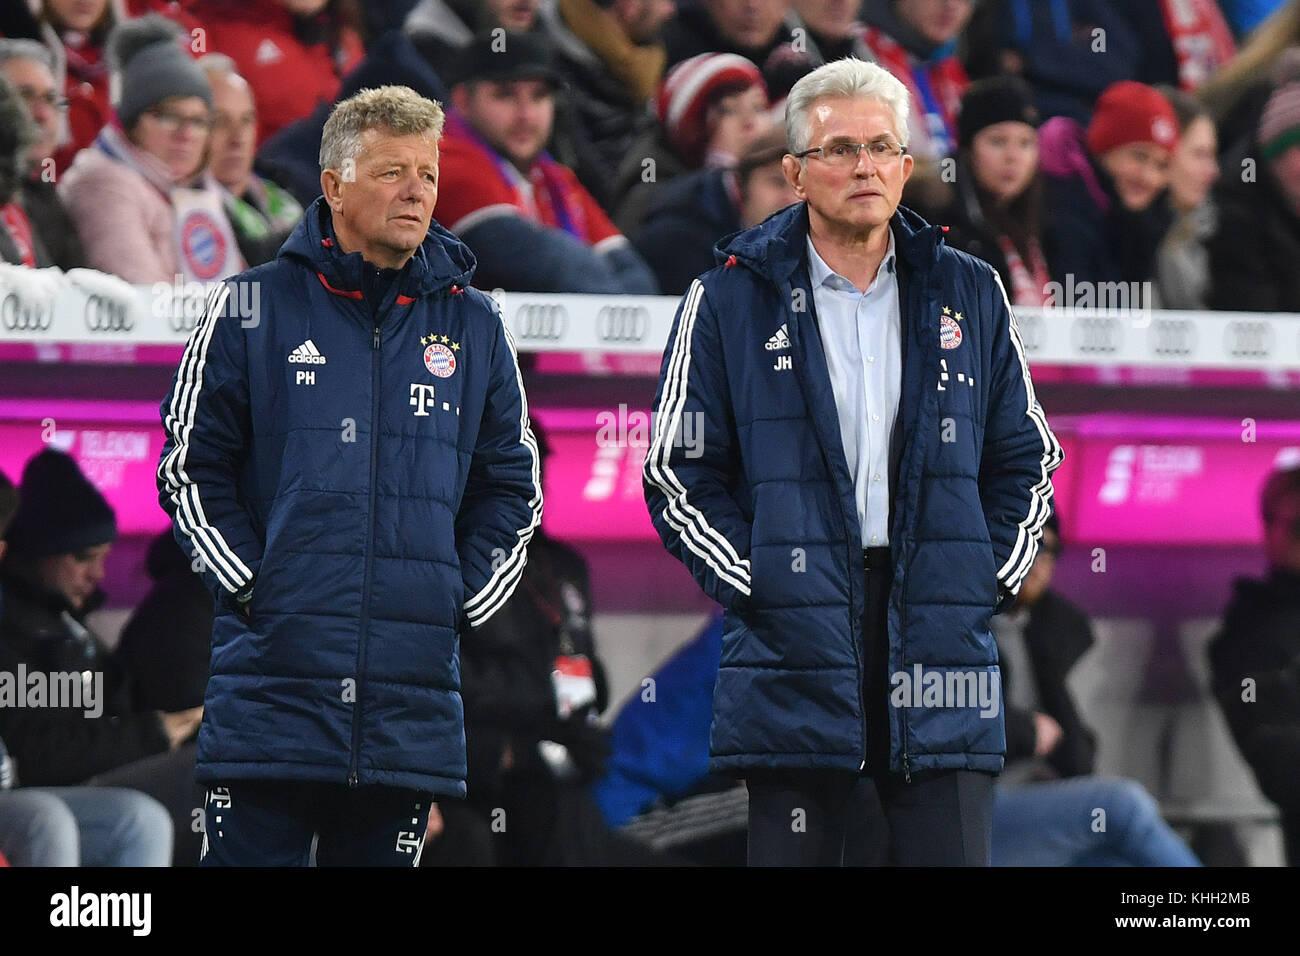 v.re:Jupp HEYNCKES (Trainer FC Bayern Munich), Peter HERMANN (Co Trainer FCB). Fussball 1. Bundesliga, 12.Spieltag, - Stock Image